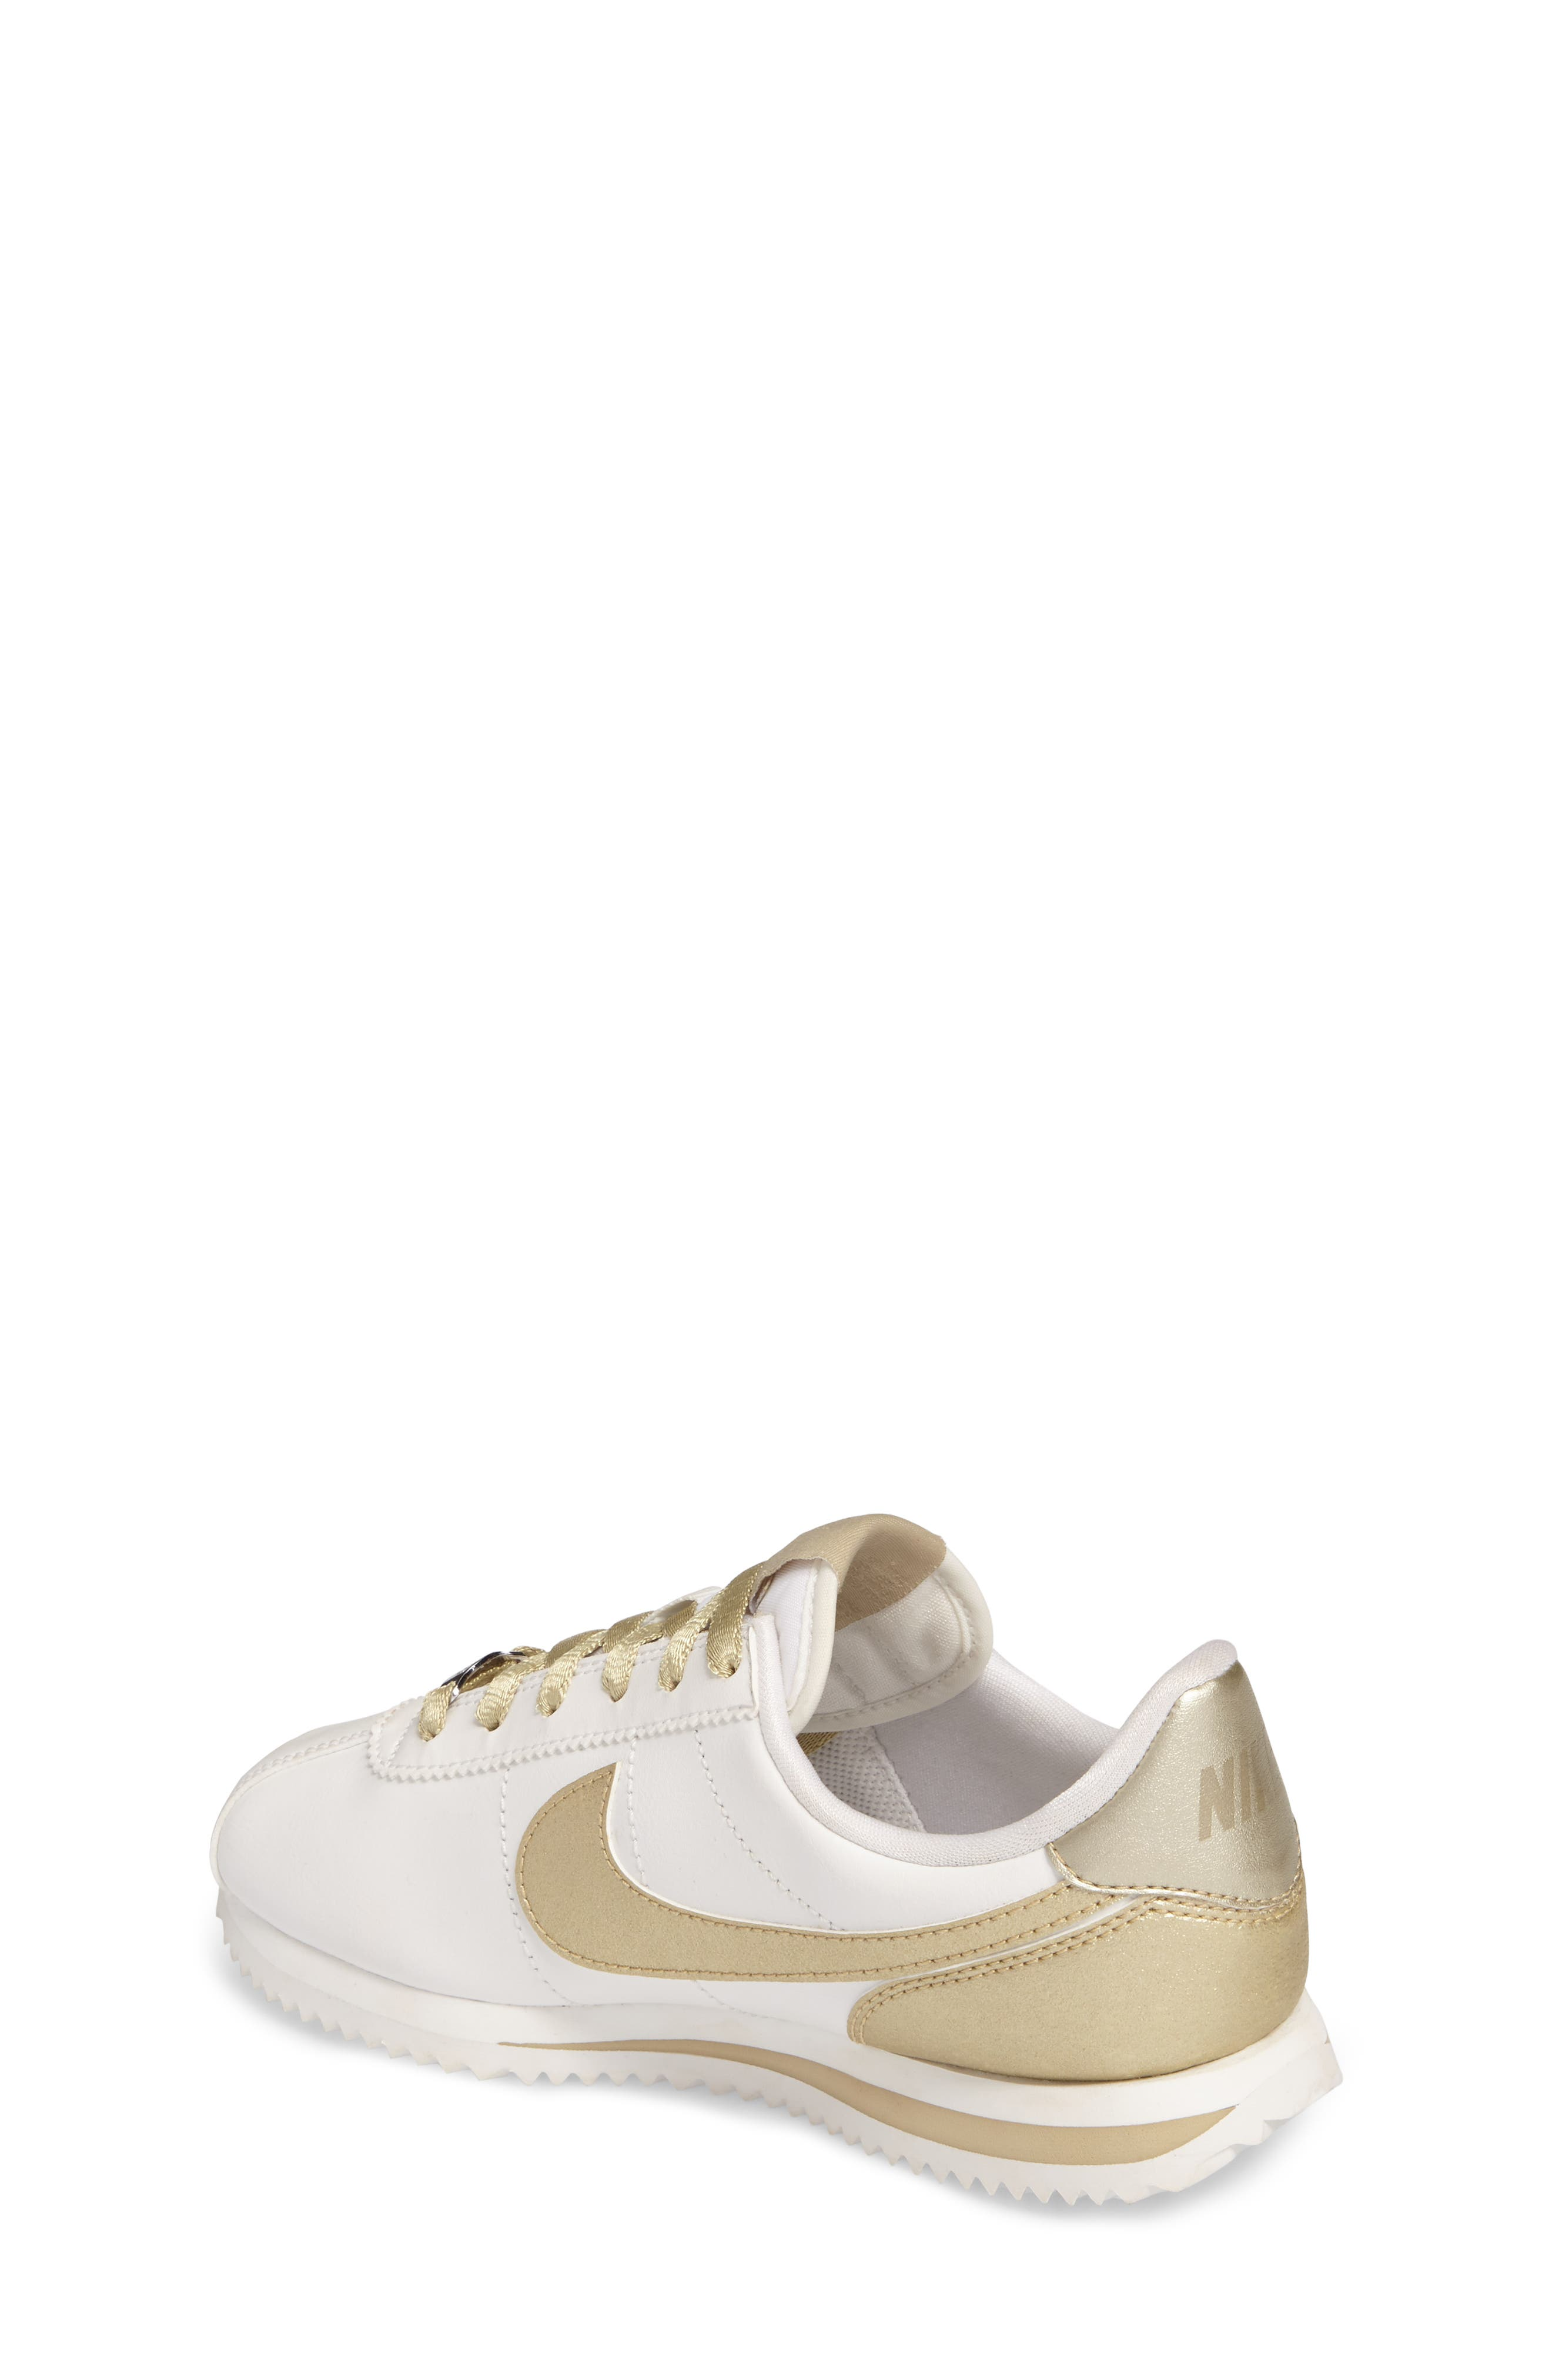 Cortez Basic SE Sneaker,                             Alternate thumbnail 2, color,                             101